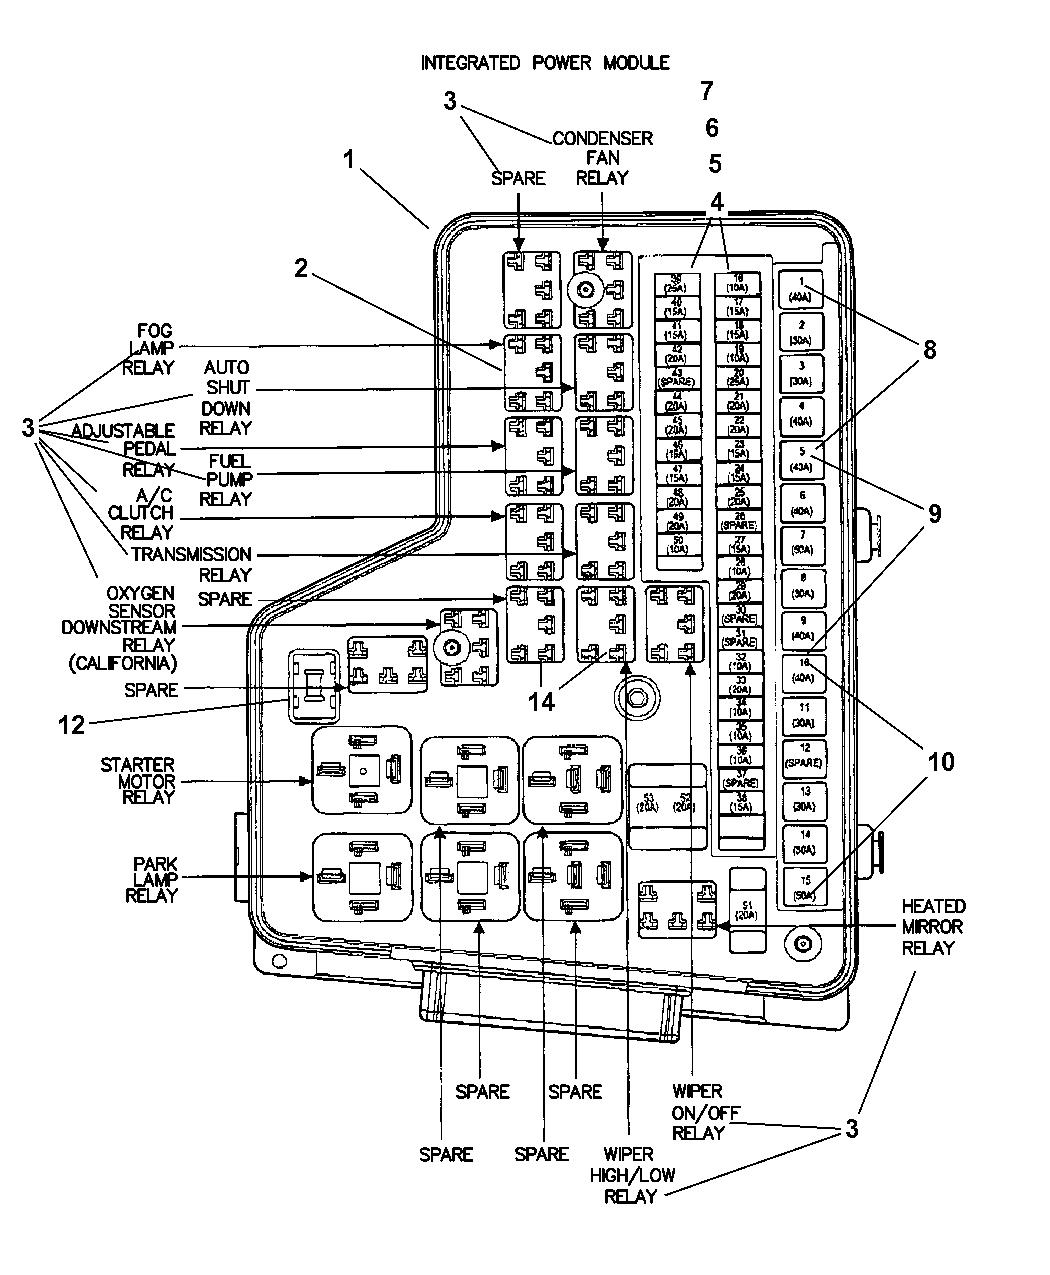 2005 Dodge Ram 2500 Power Distribution Center, Fuses & RelaysMopar Parts Giant